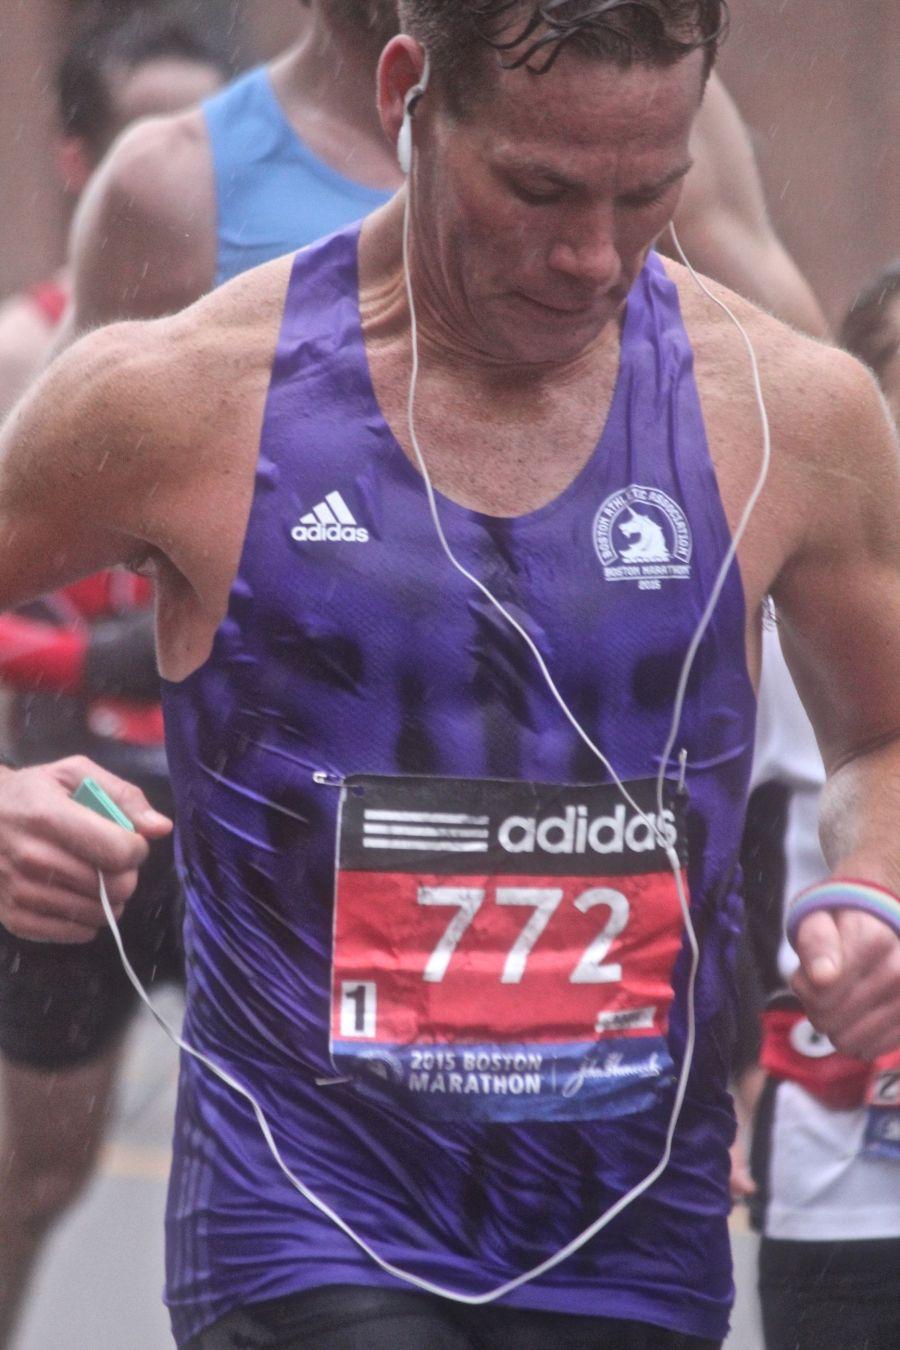 boston marathon april 20 2015 racer number 772